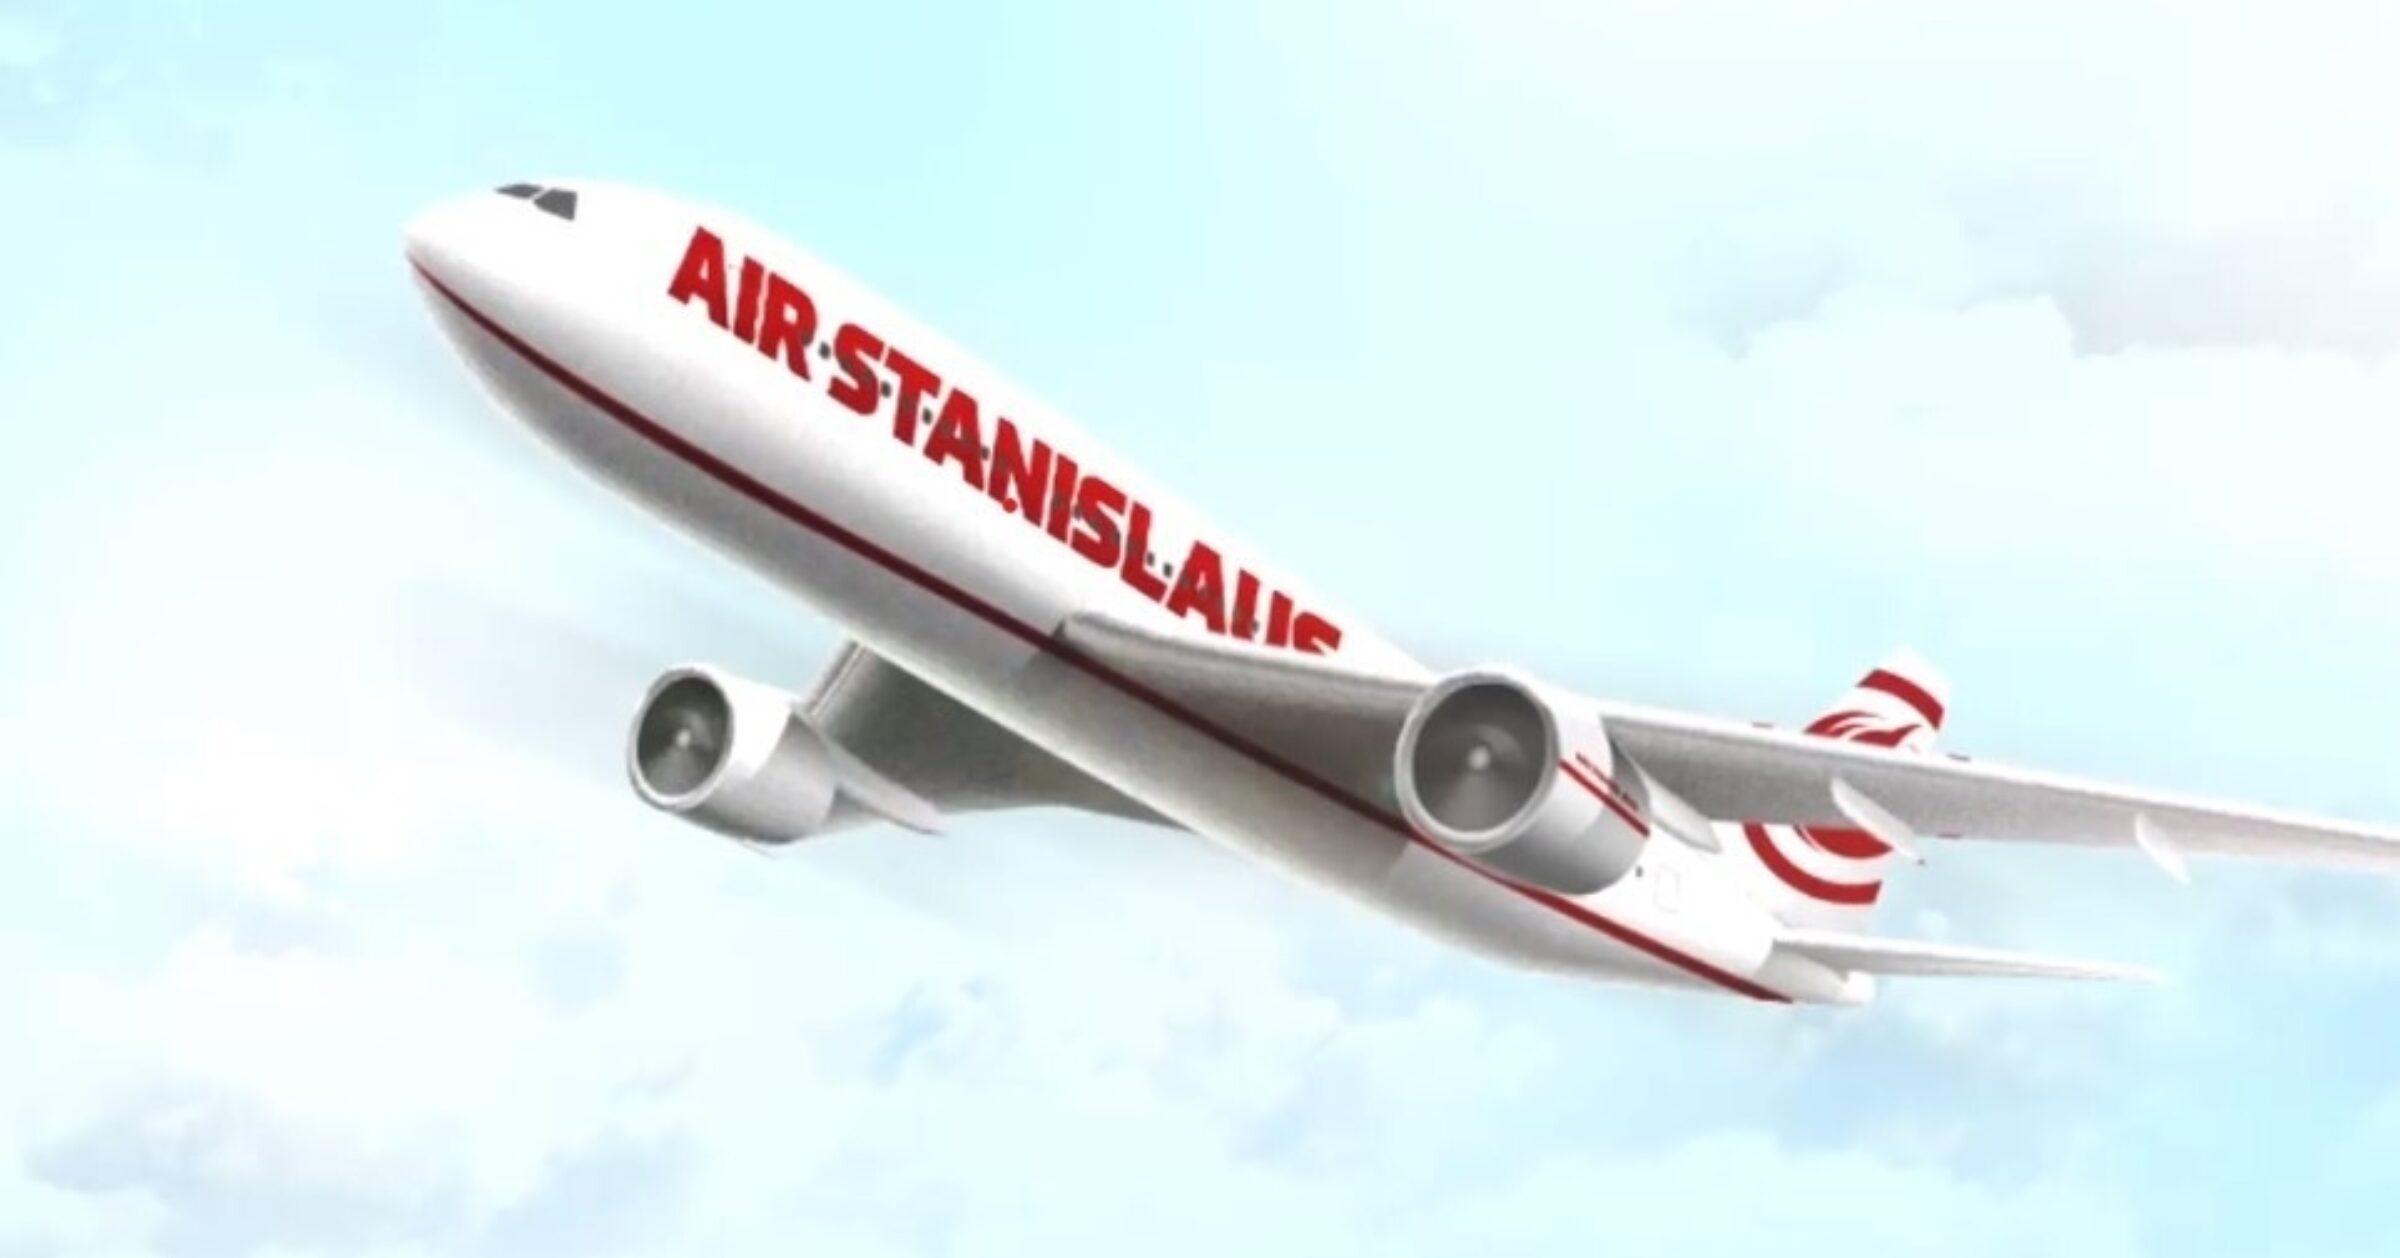 Air Stanislaus Enschede